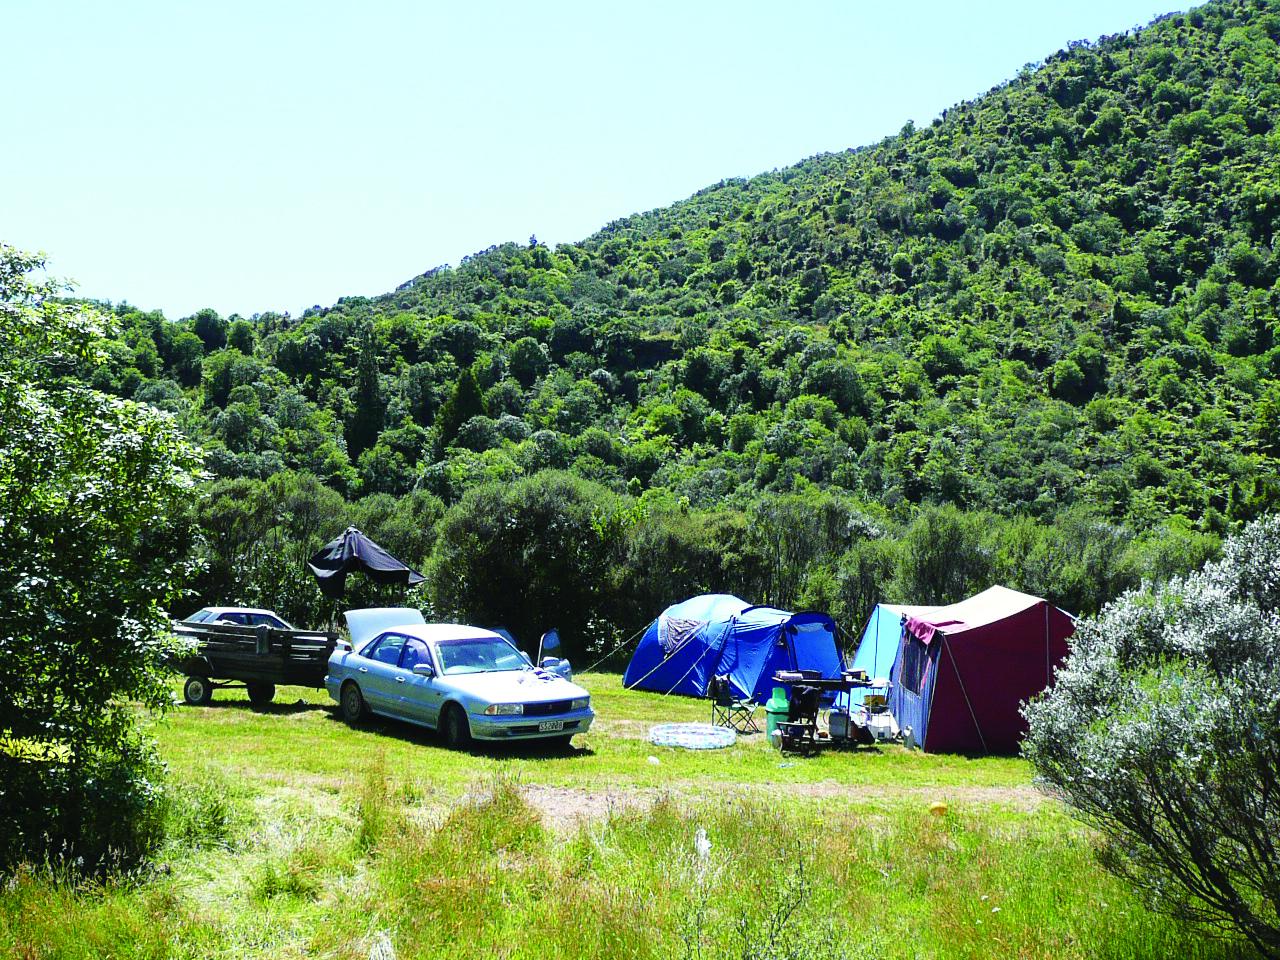 Otaki Forks Campsite - Otaki Forks area, Wellington Region, NZ - 12